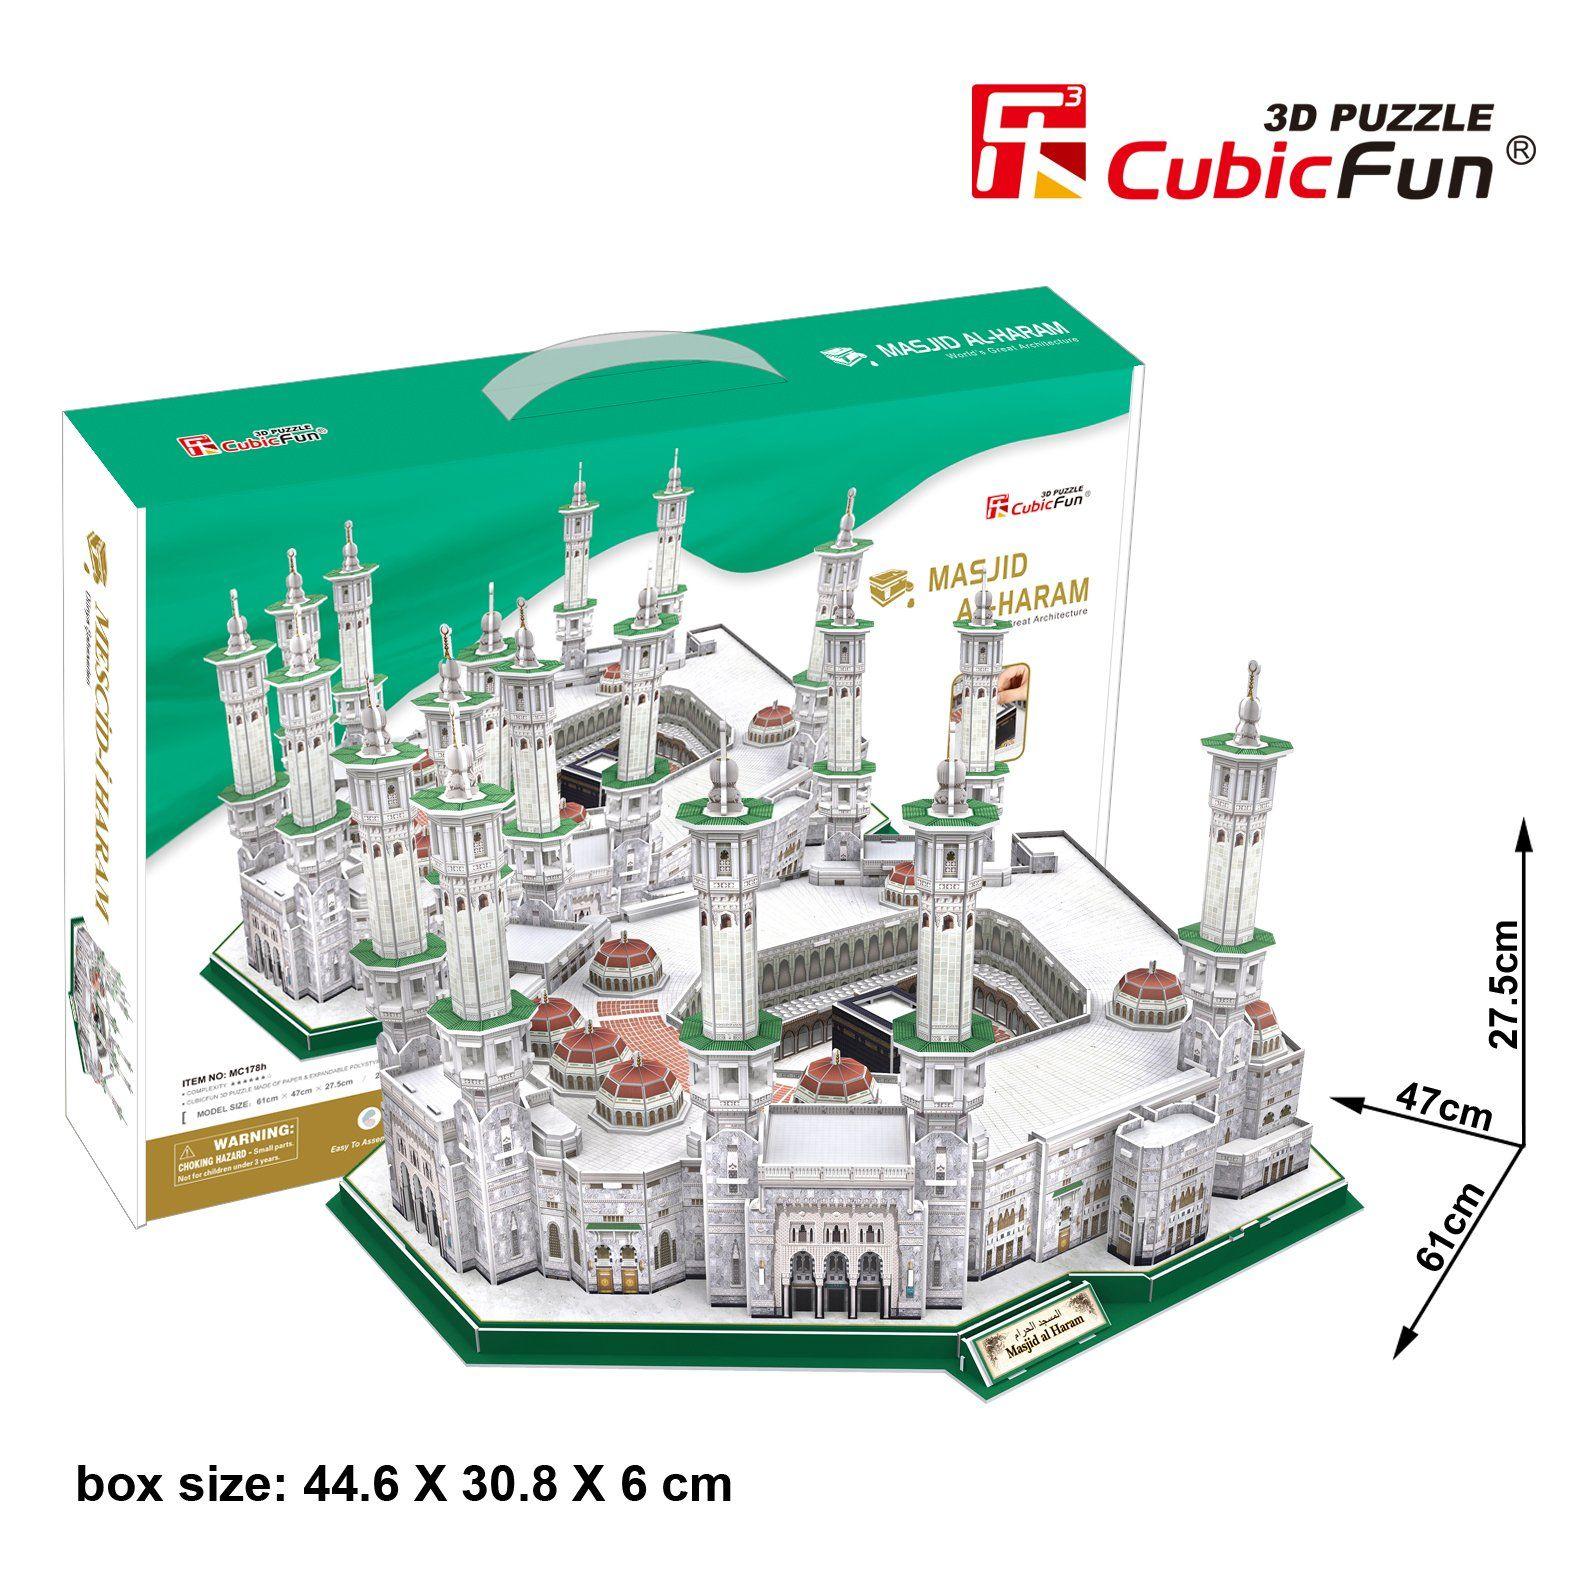 Cubic Fun 3d Puzzle Masjid Al Haram Moschee Mekka Saudi Arabien Groß Amazon De Spielzeug Moschee Arabien Saudi Arabien